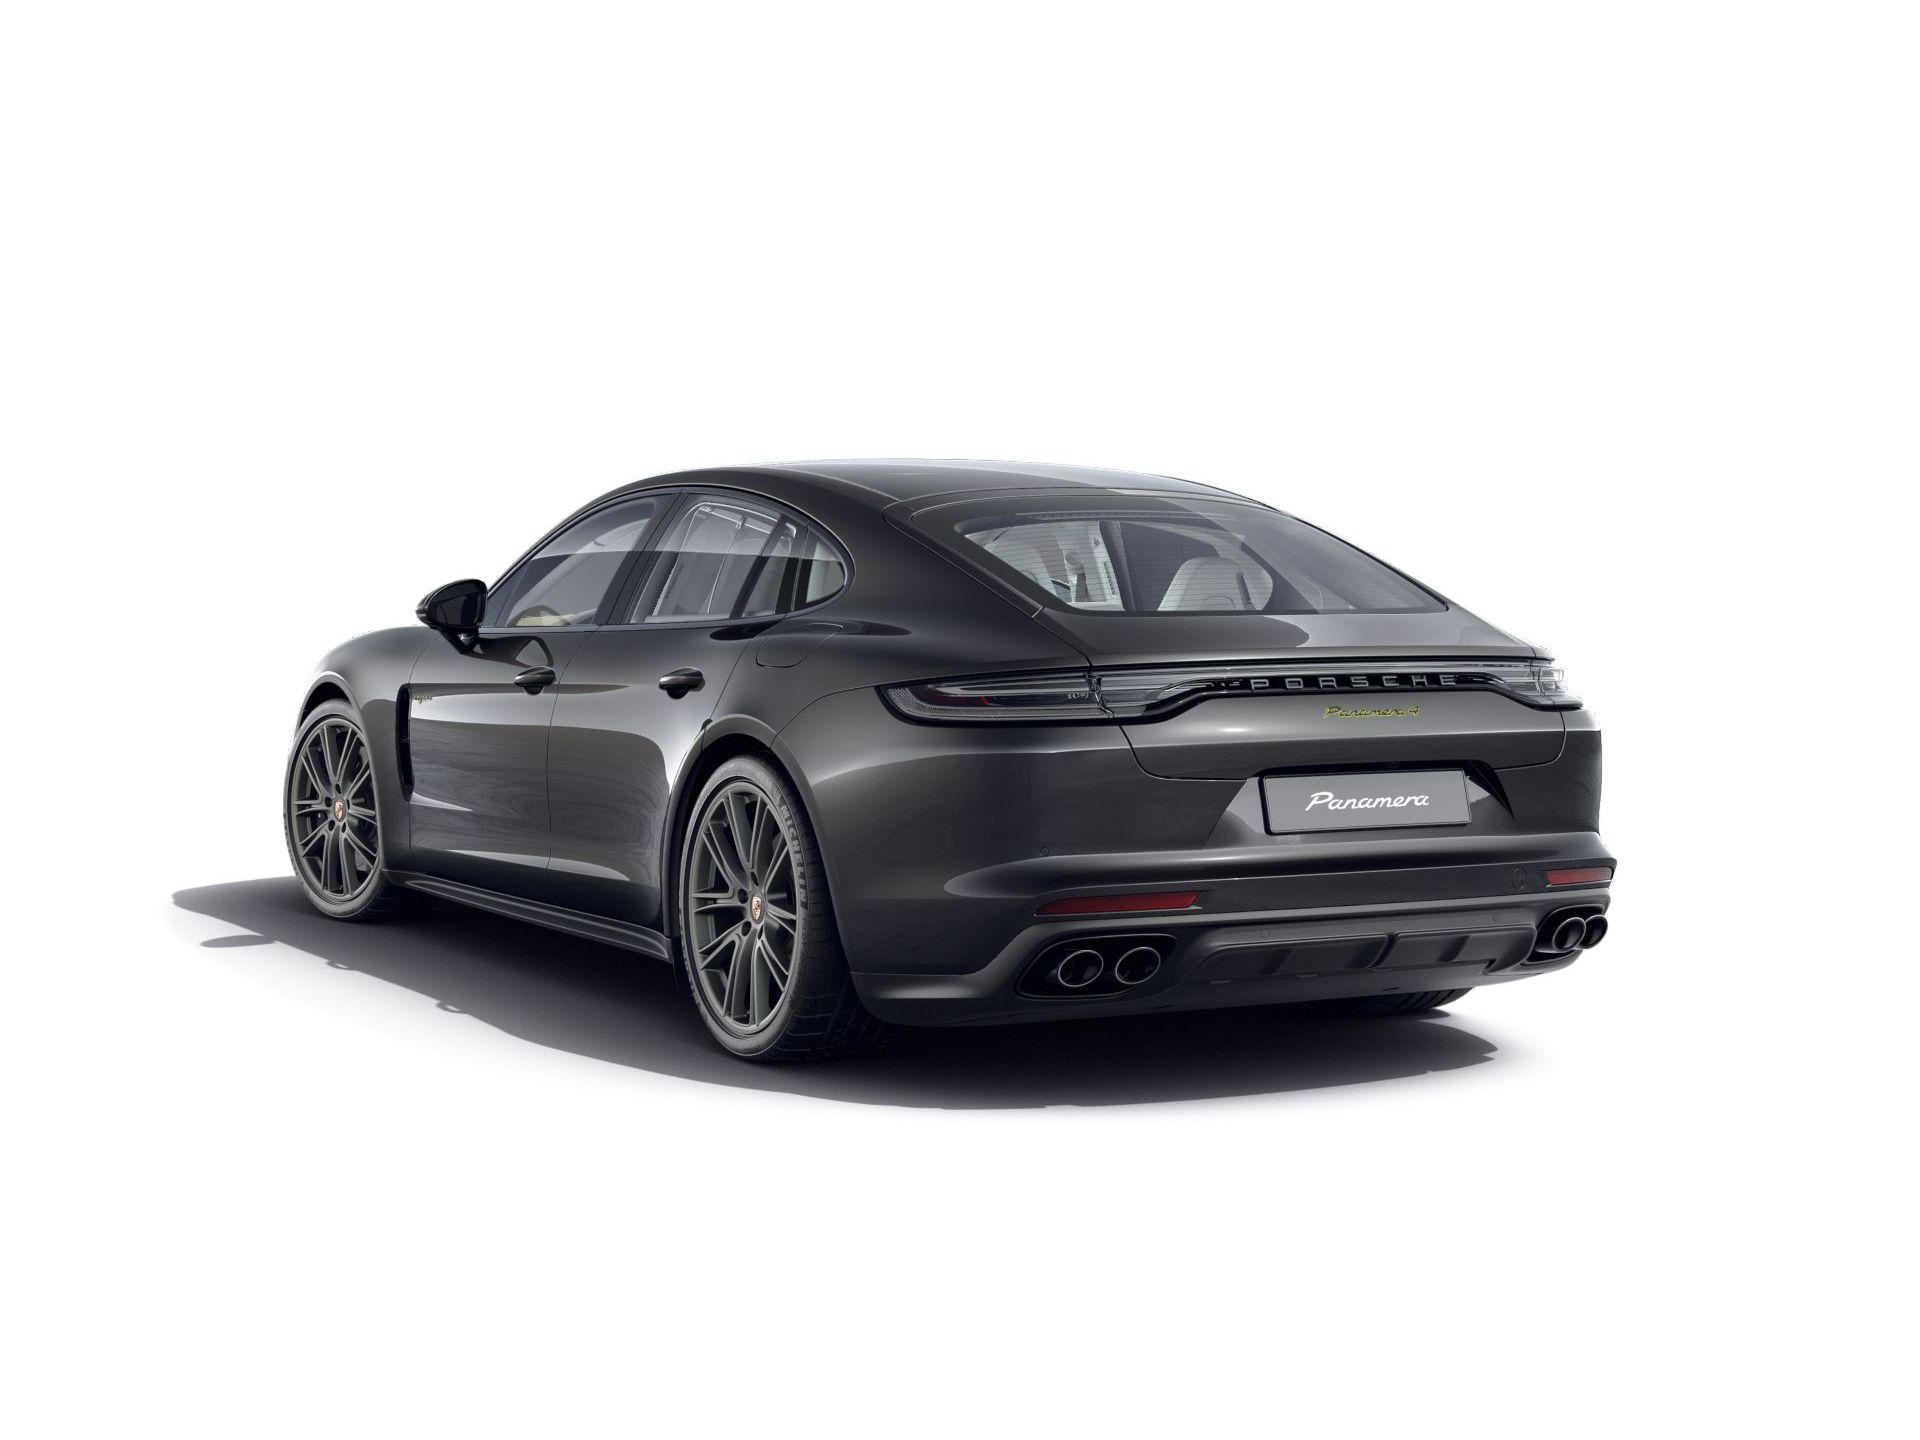 2022 Porsche Panamera 4 E-Hybrid – 3